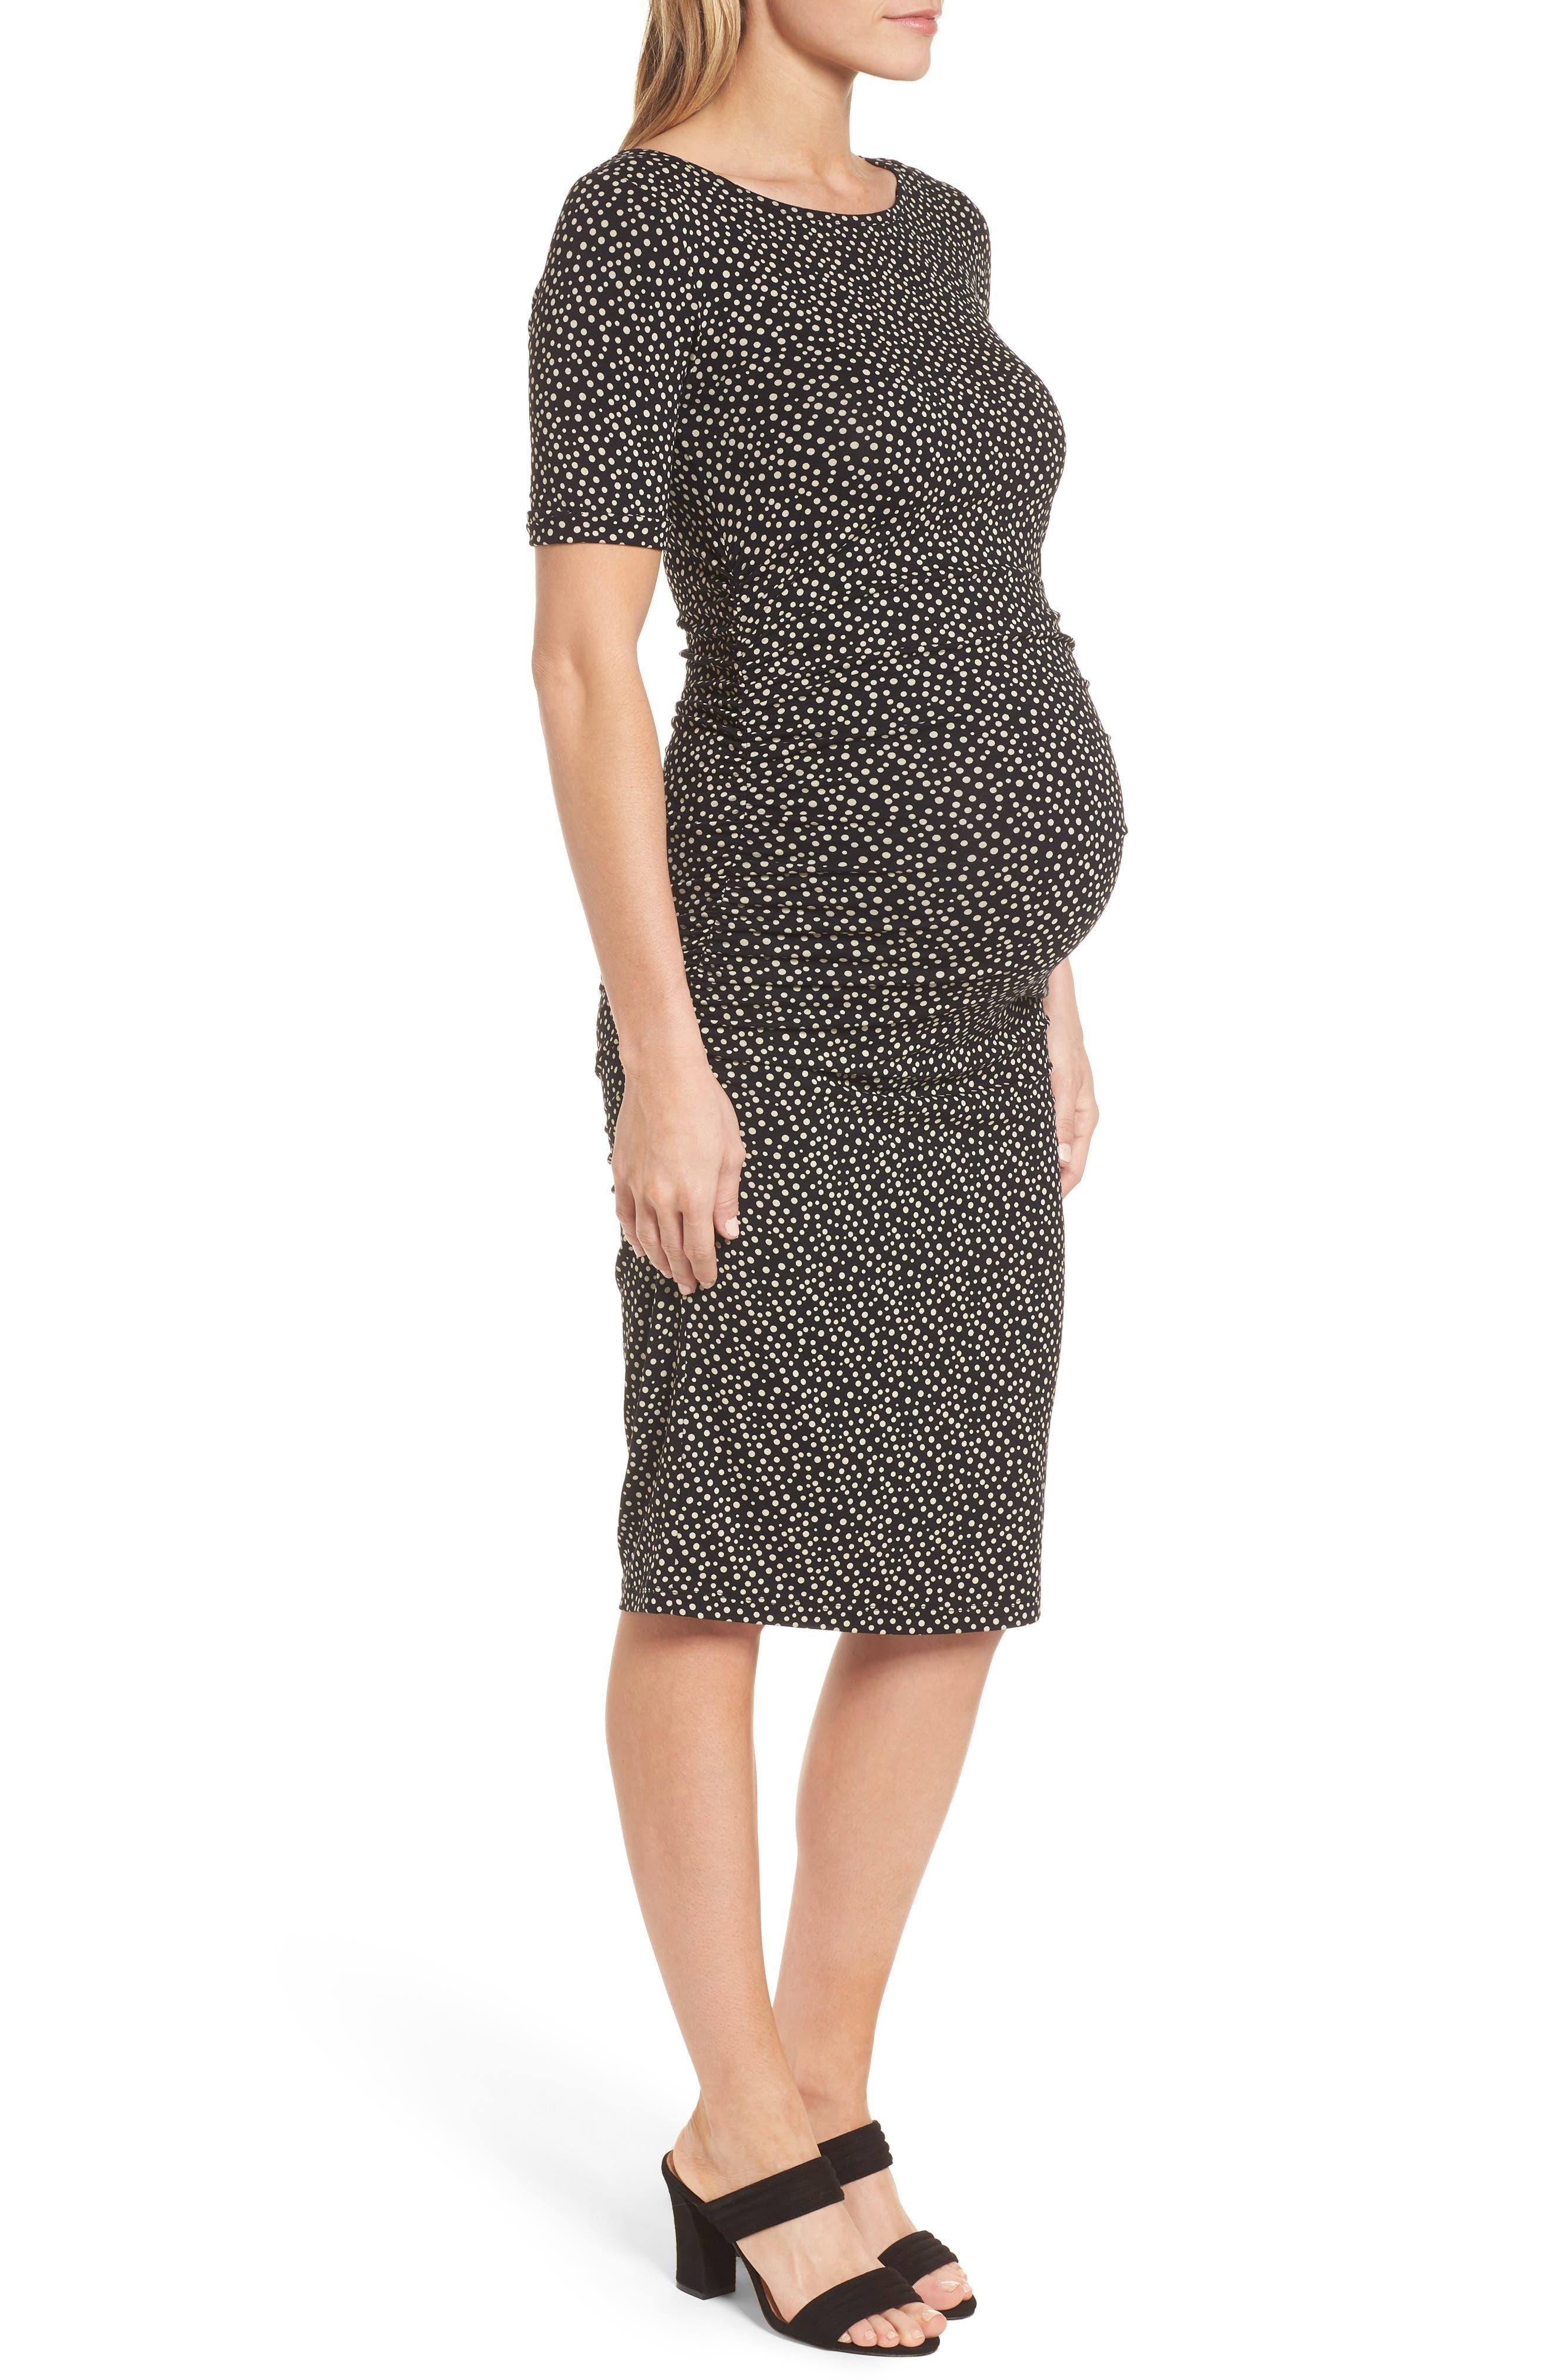 Danni Ruched Maternity Dress,                             Alternate thumbnail 3, color,                             Polka Print